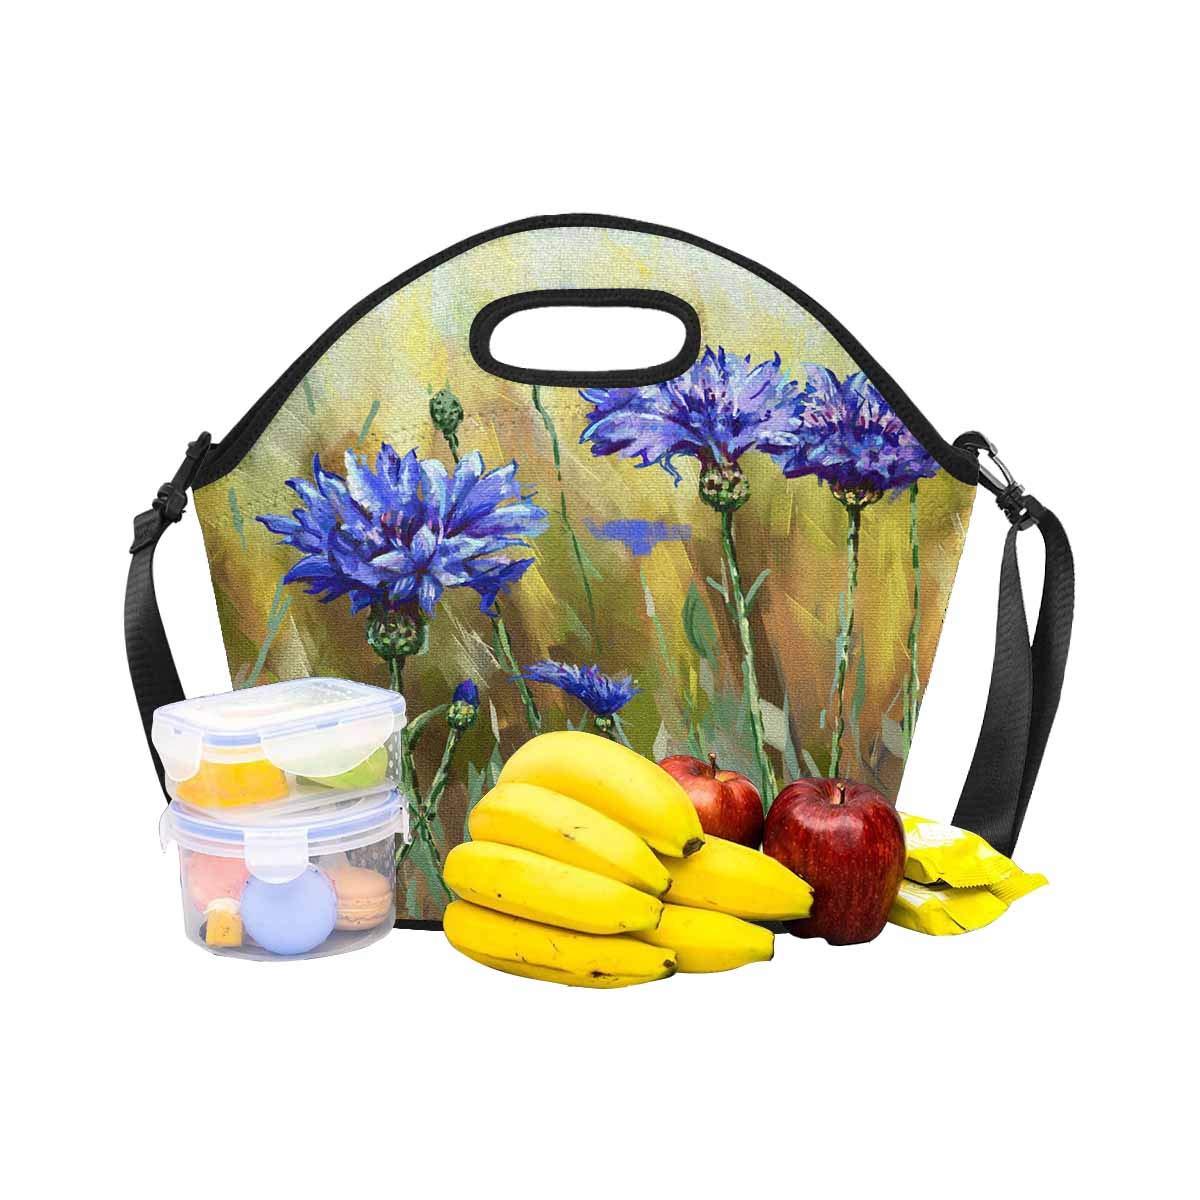 848c1455dc36 Amazon.com: InterestPrint Cornflower Flower Oil Painting Lunch Tote ...